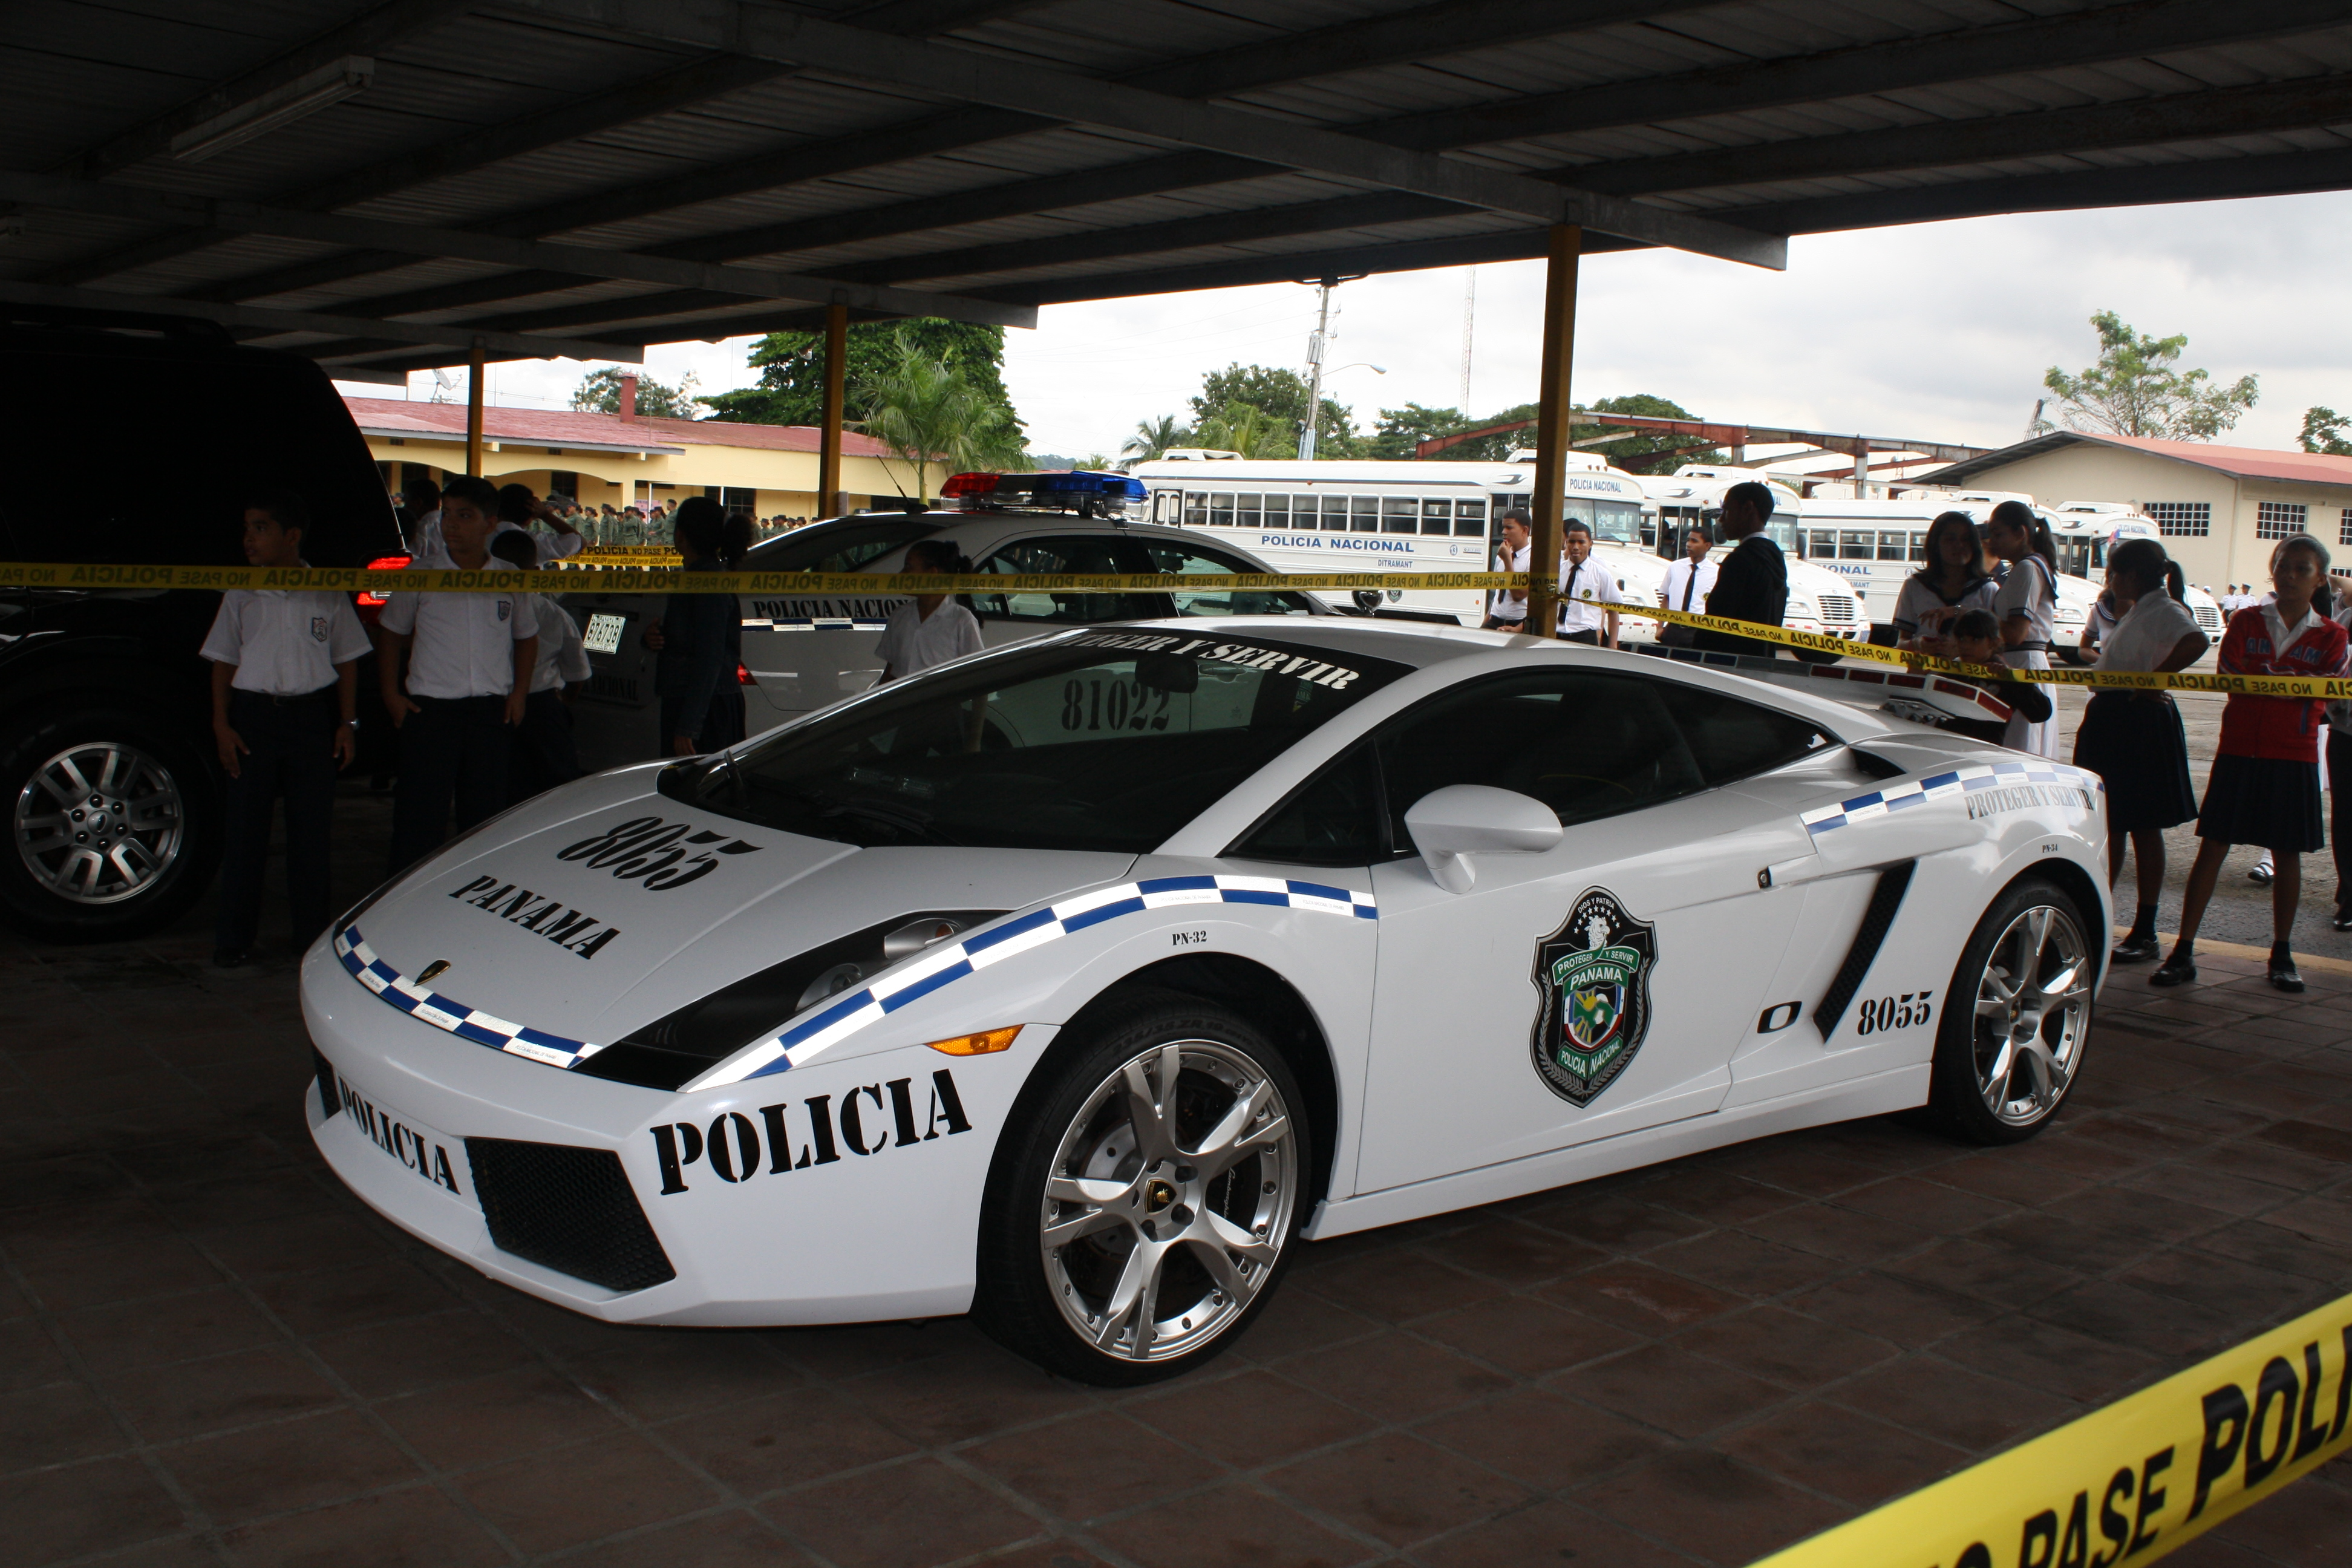 file auto patrulla lamborghini de la polic a nacional de. Black Bedroom Furniture Sets. Home Design Ideas